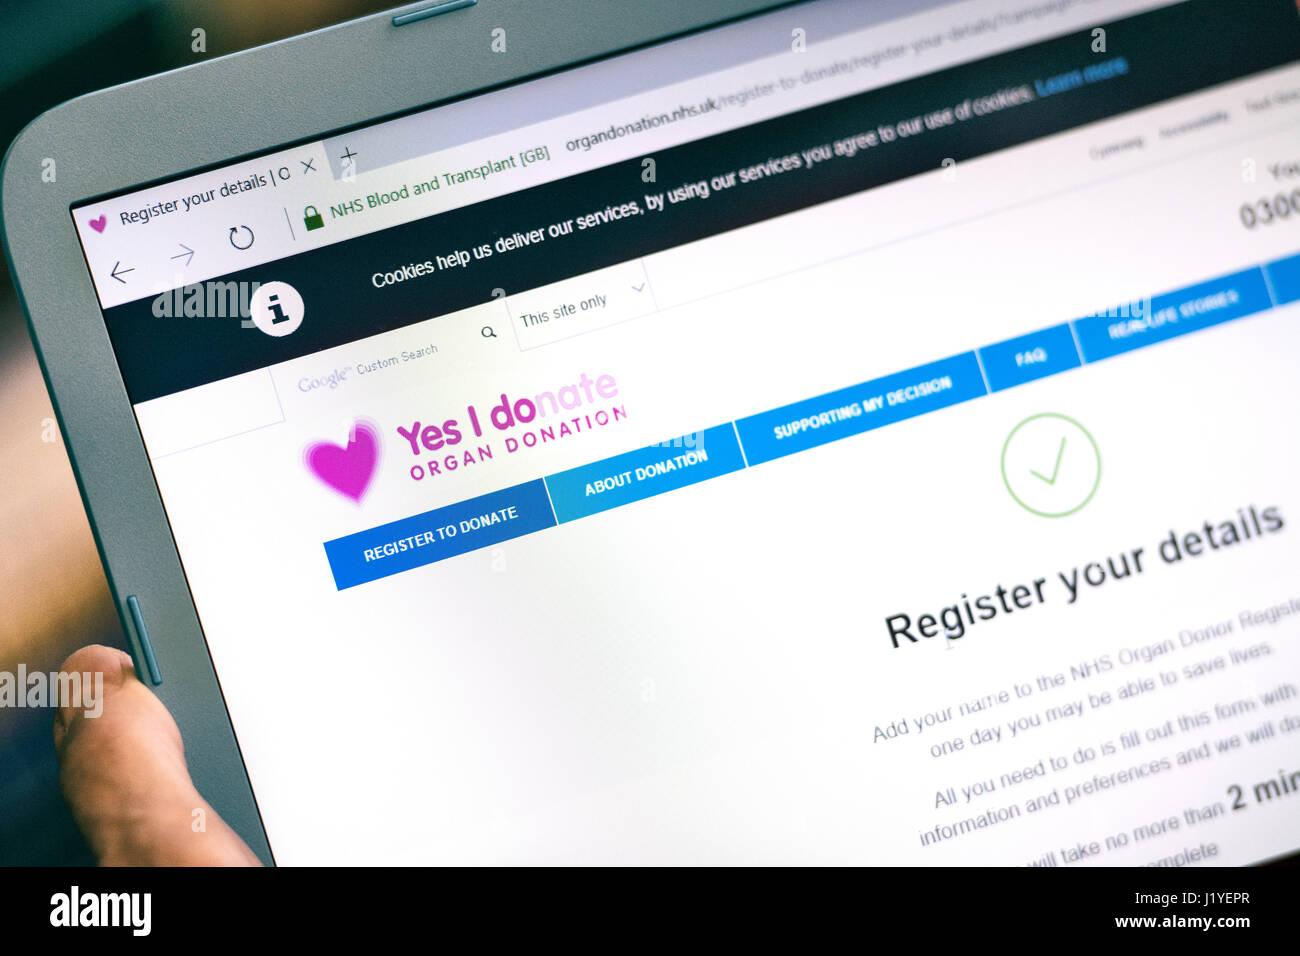 Organ Donation, Blood and Transplant NHS Registry registration online website, web page - Stock Image